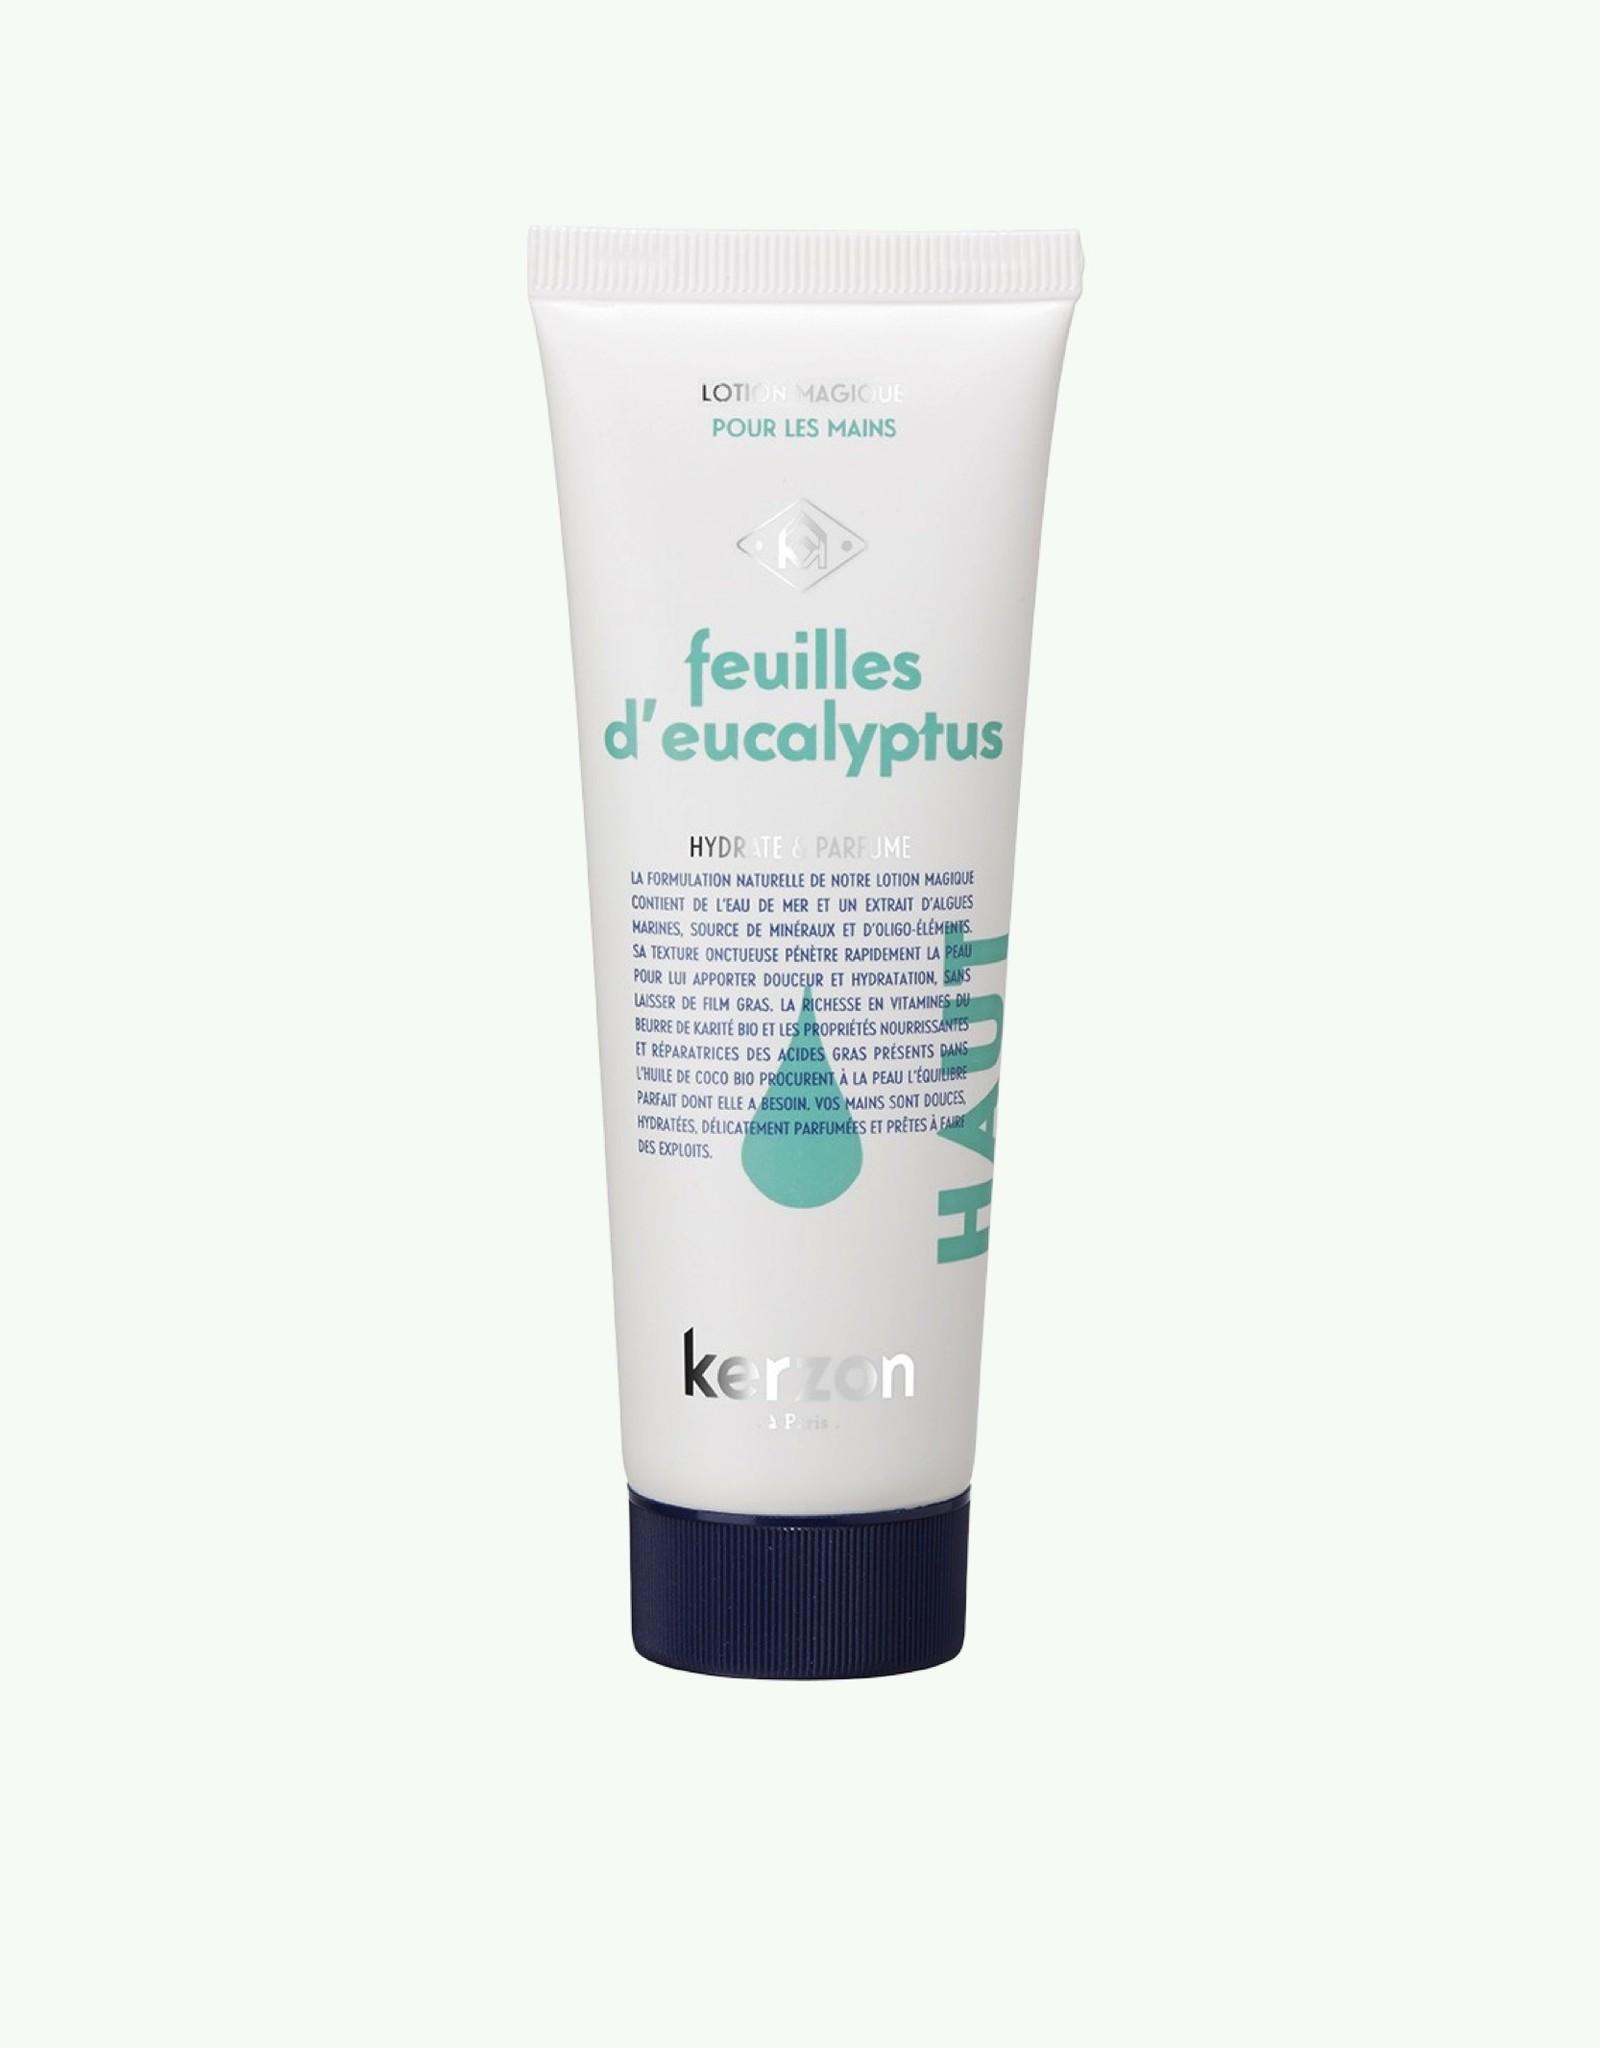 Kerzon Duo Feuilles d'Eucalyptus - Liquid soap and hand lotion - Kerzon